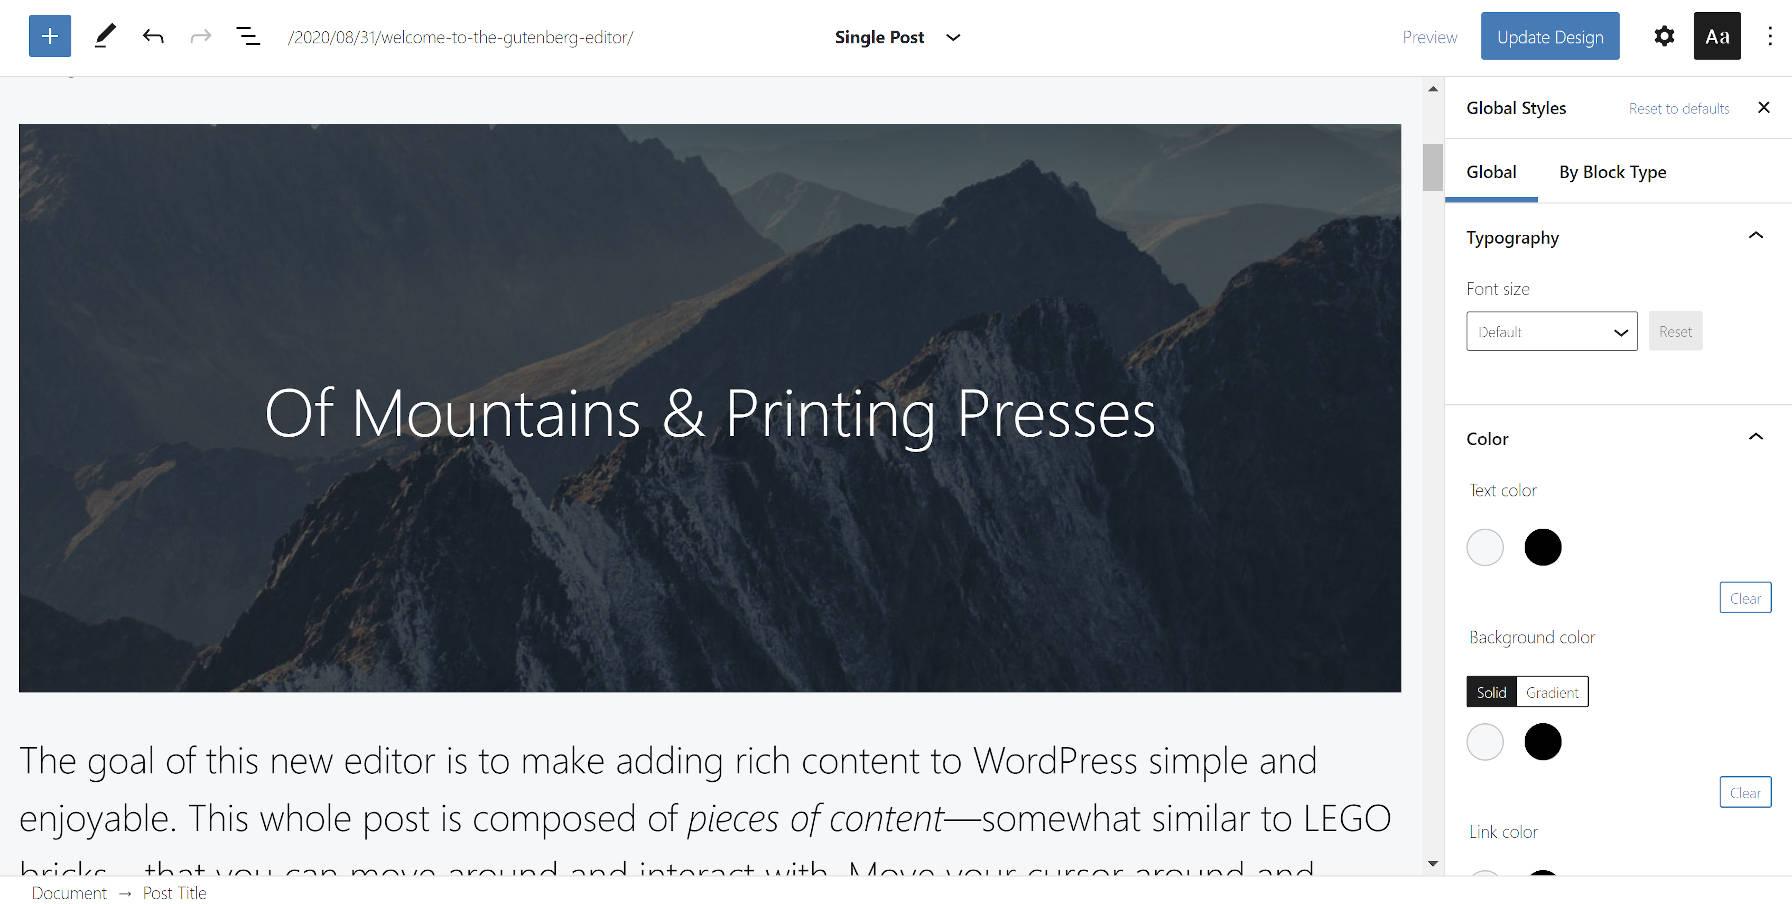 q-first-fse-wordpress-theme-now-live-1问:第一个FSE WordPress主题现已上线